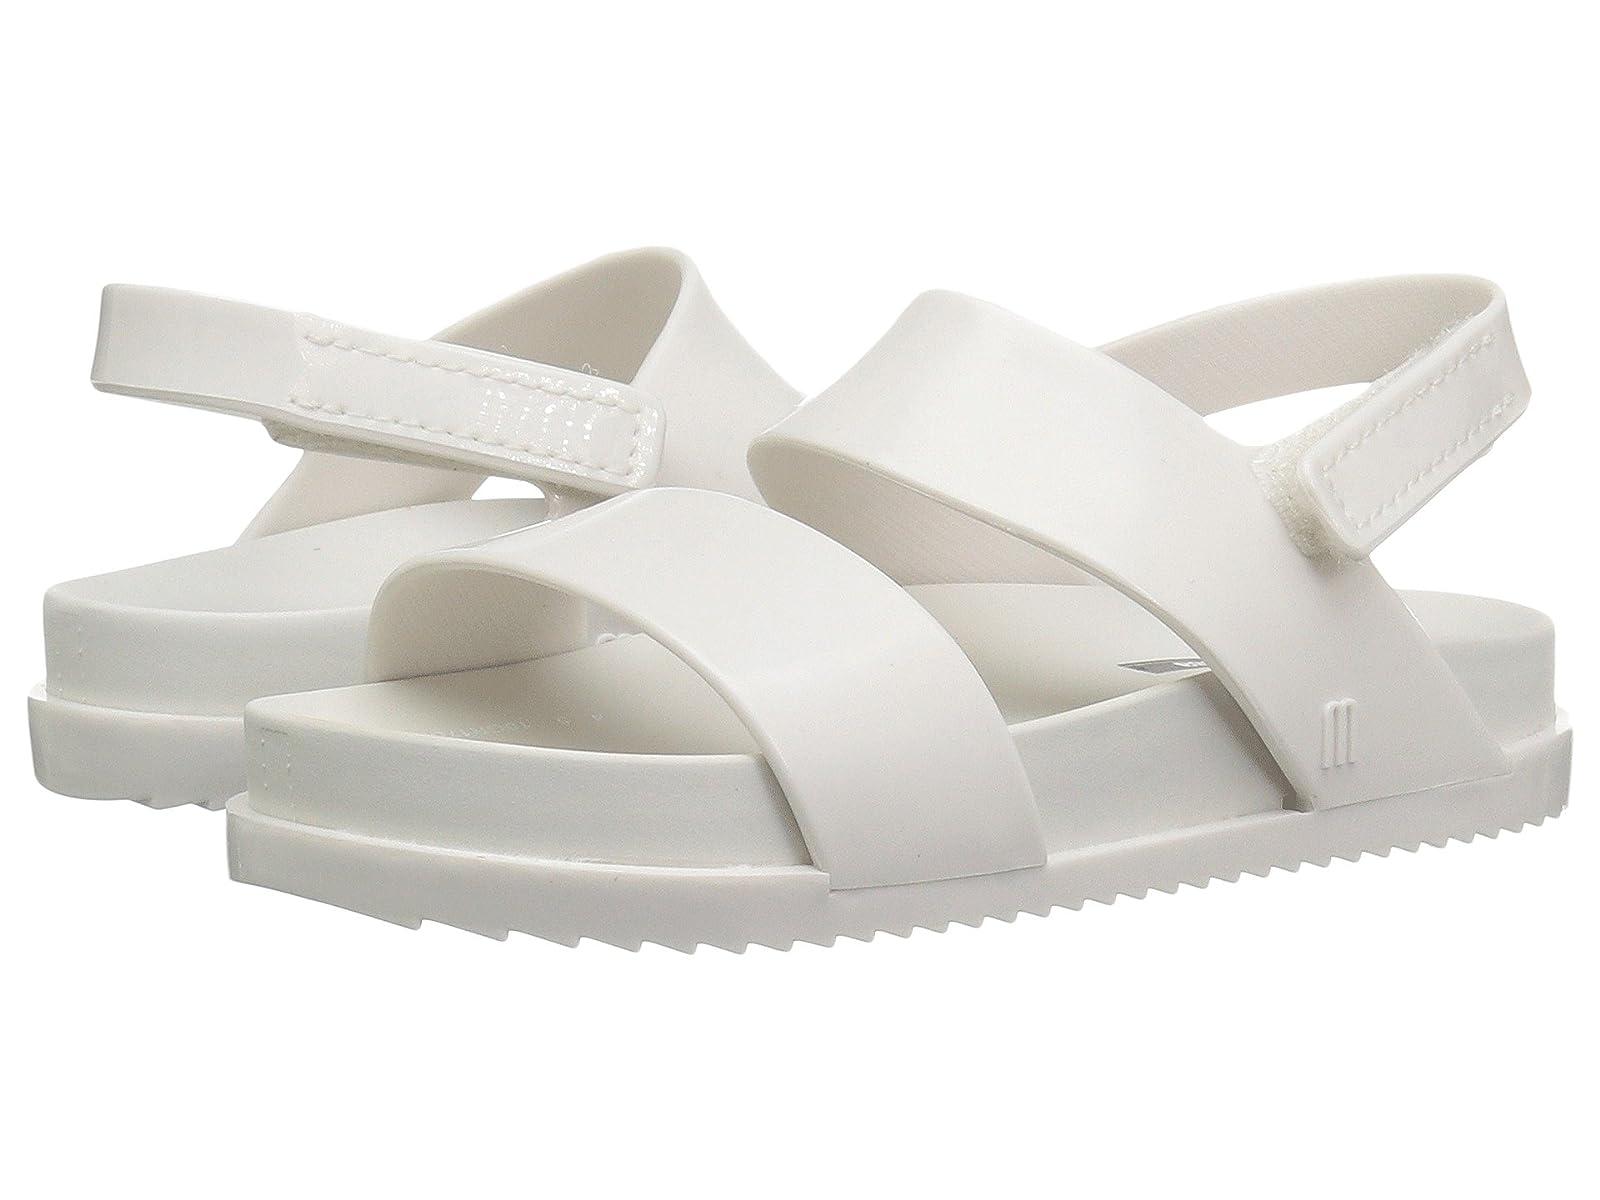 Mini Melissa Mini Cosmic Sandal (Toddler/Little Kid)Atmospheric grades have affordable shoes